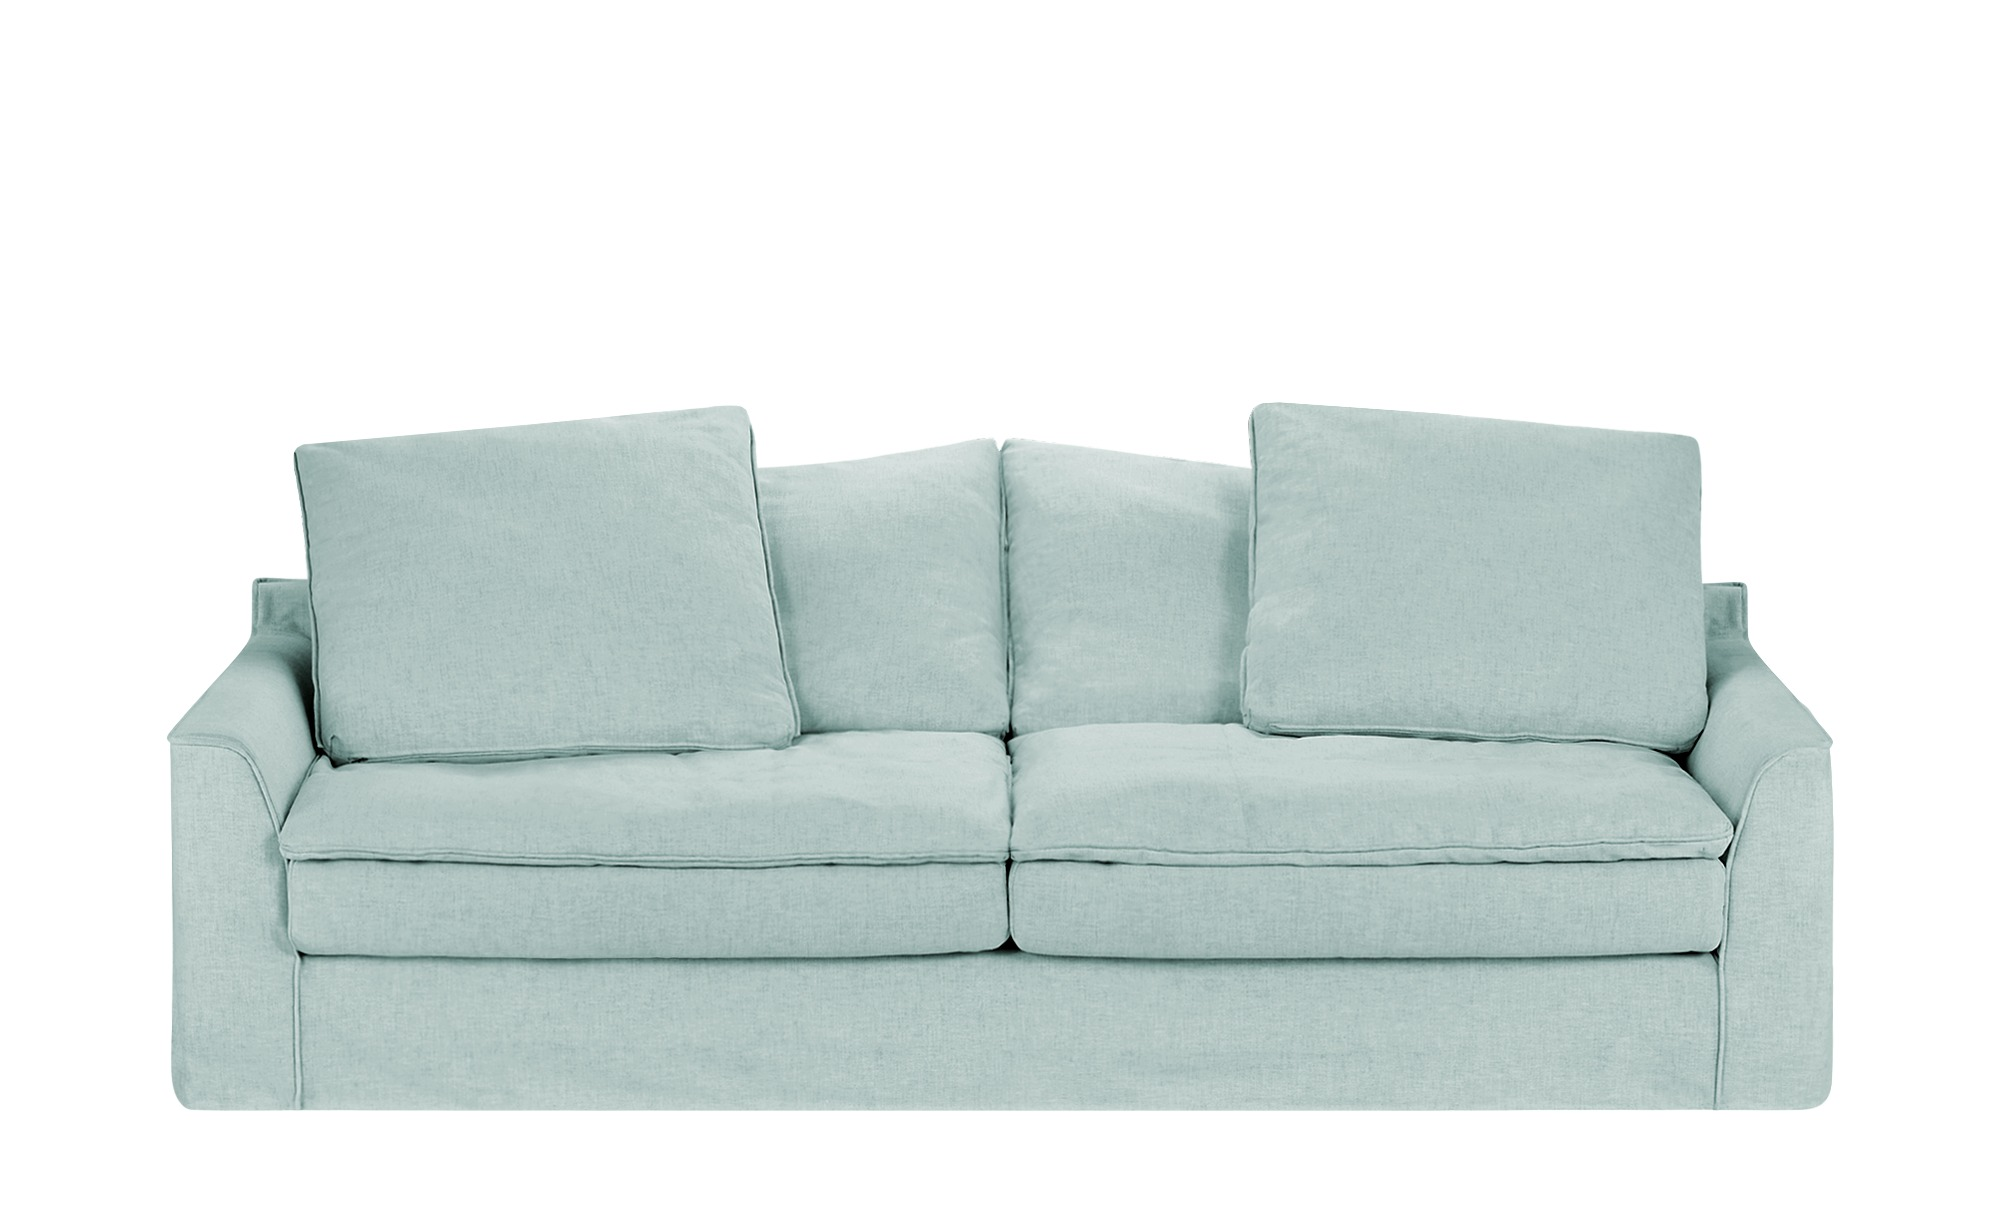 SOHO Sofa 3-sitzig  Sarvika ¦ blau ¦ Maße (cm): B: 233 H: 95 T: 114 Polstermöbel > Sofas > 3-Sitzer - Höffner